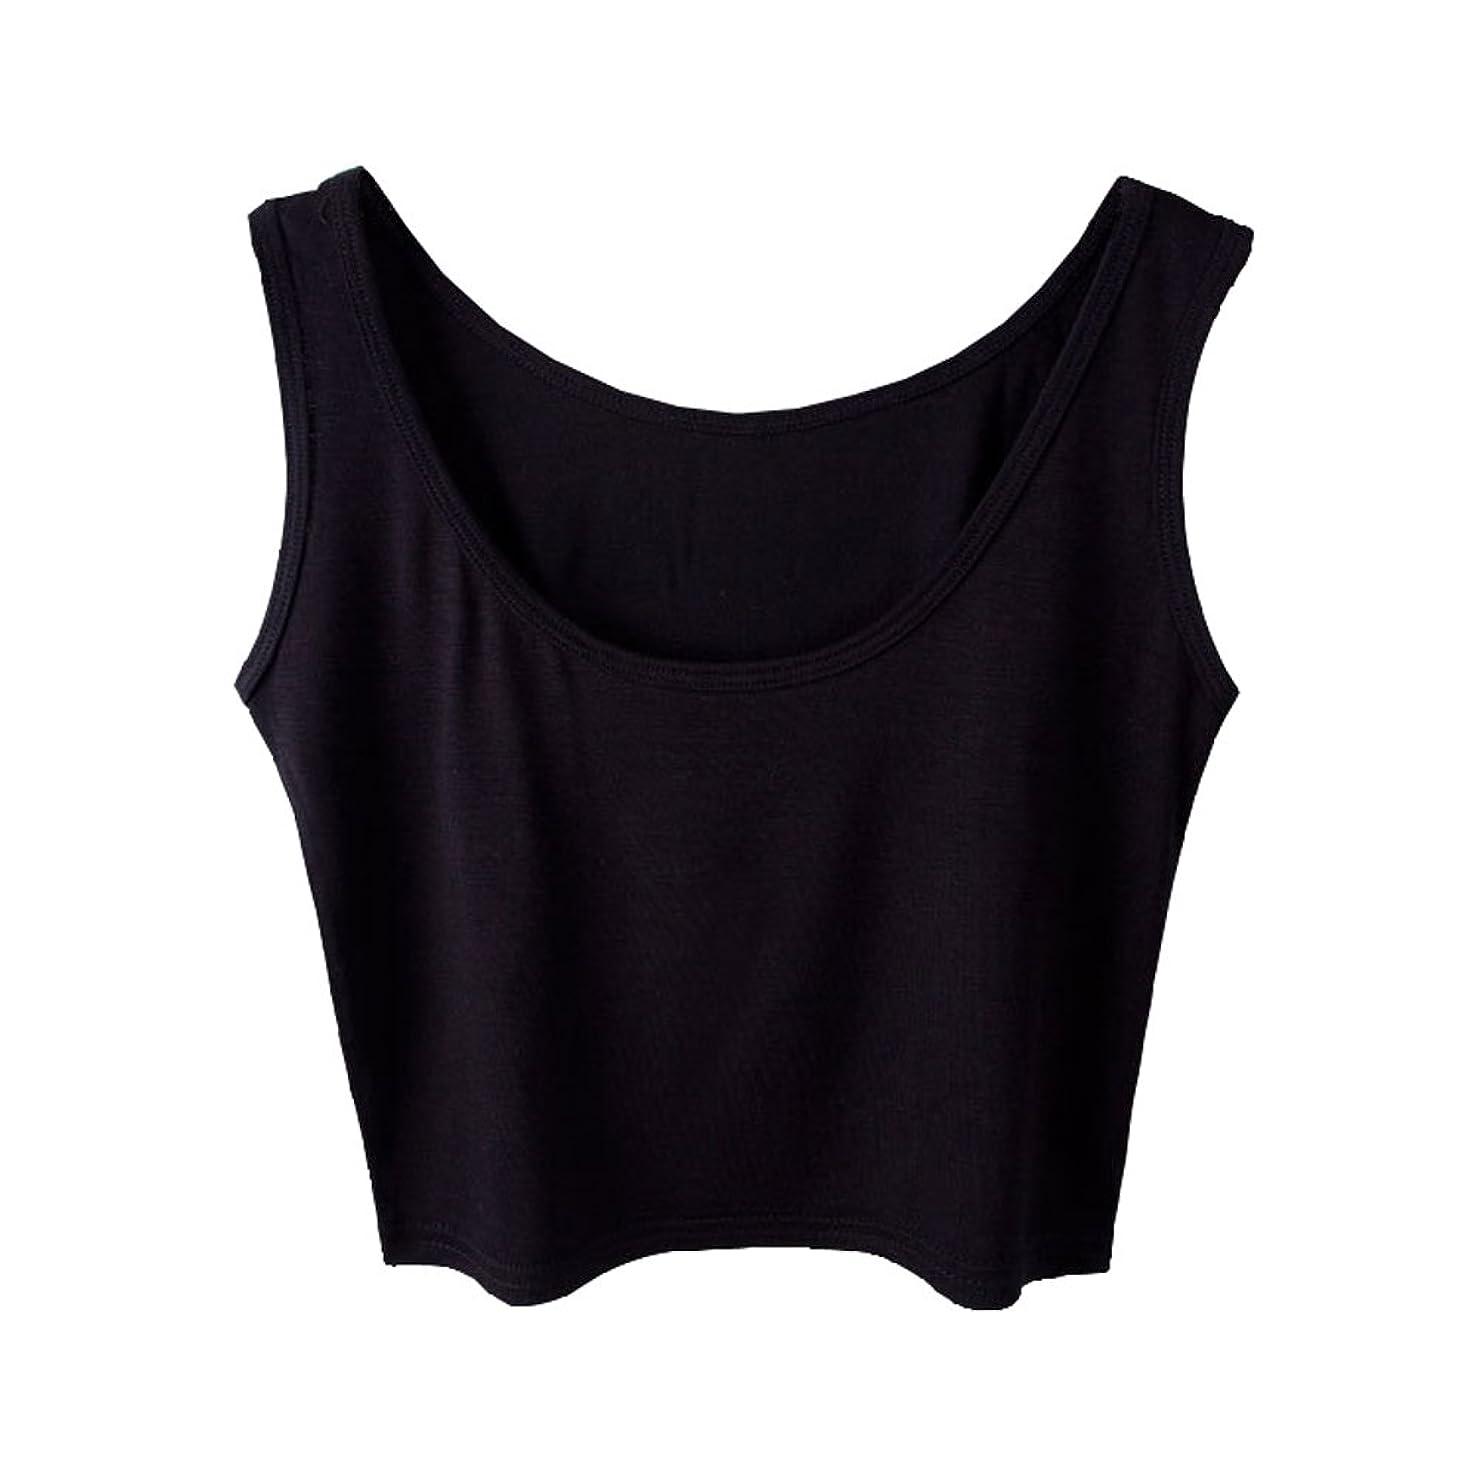 Micmall Women's Tanks & Camis Camisole Short U-Neck Tight-Fitting Thin Crop Vest